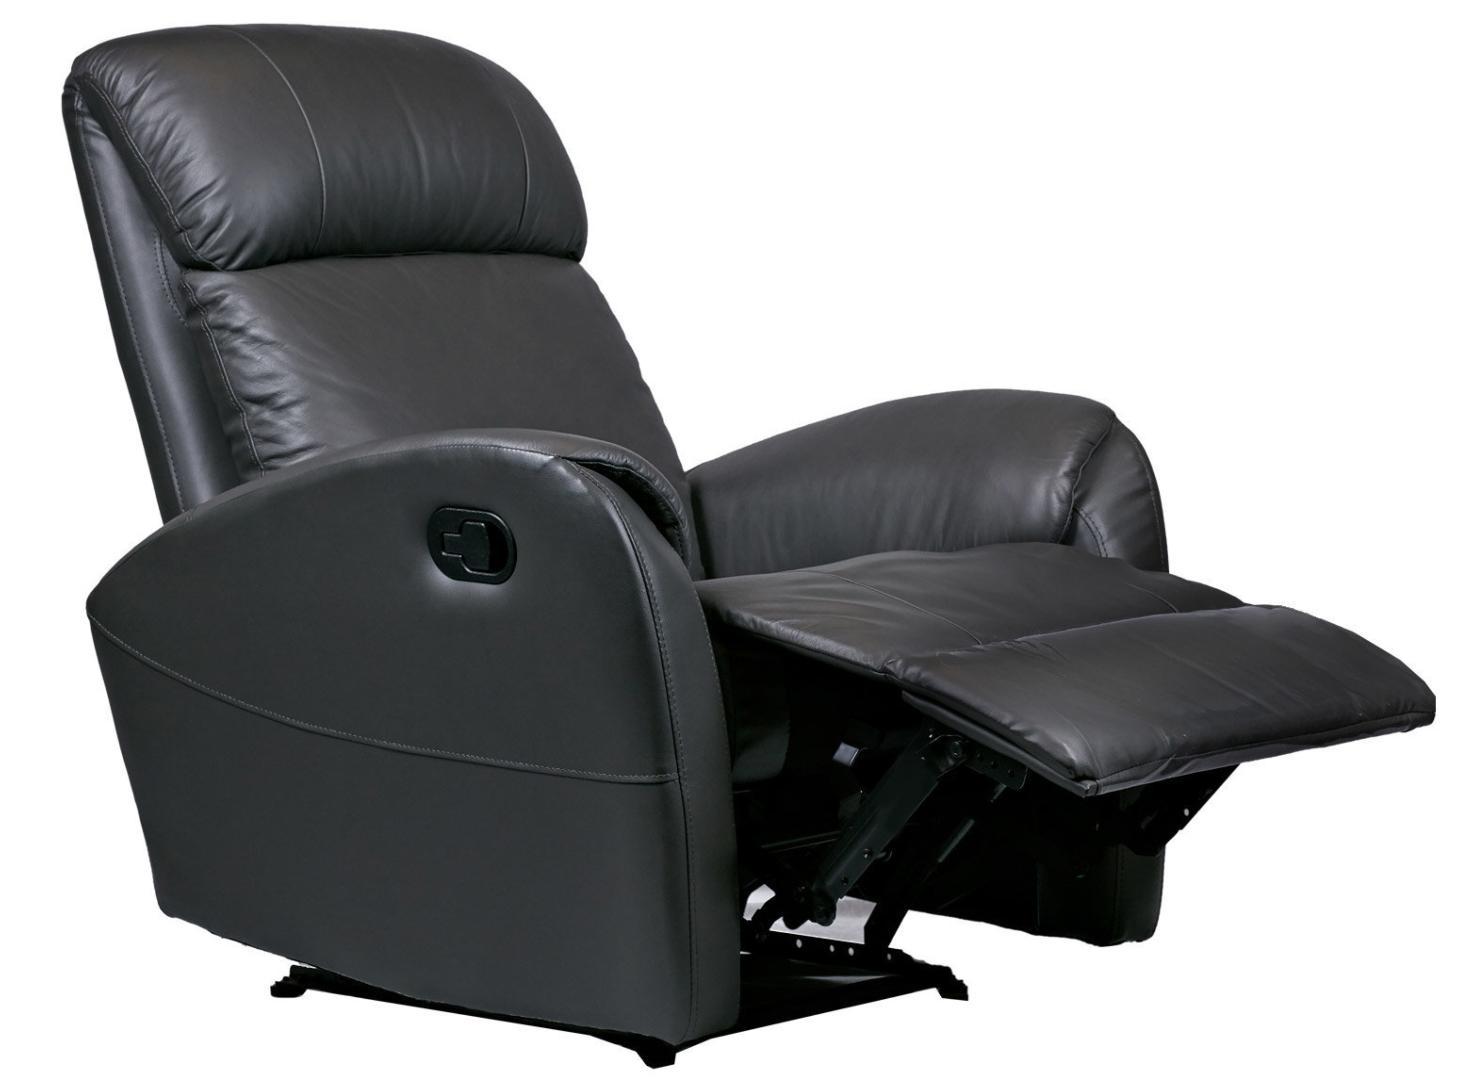 fauteuil de relaxation manuel cuir gris balbo. Black Bedroom Furniture Sets. Home Design Ideas